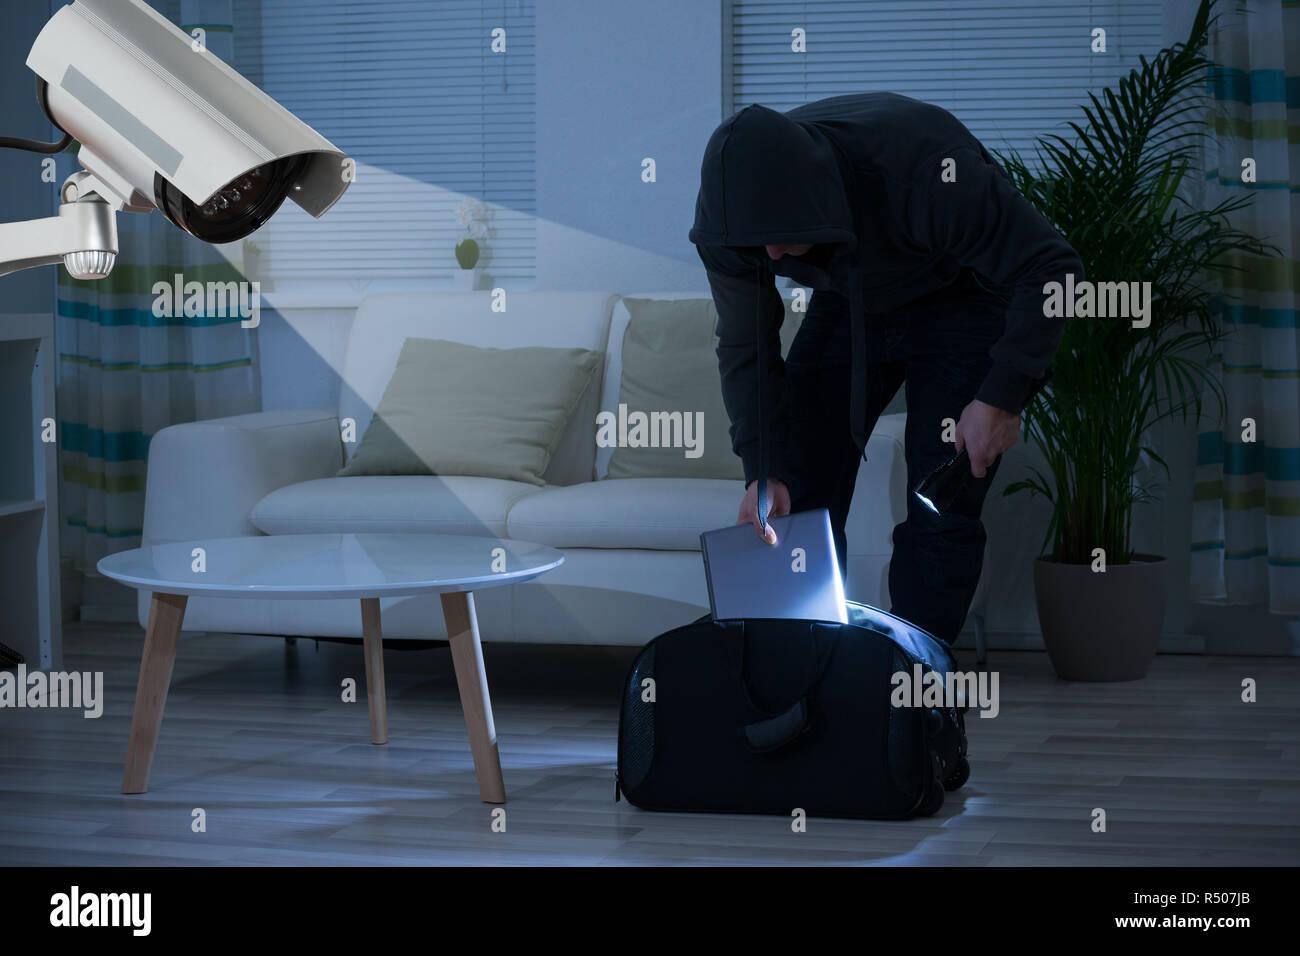 Burglar Putting Laptop Into Bag At Home - Stock Image